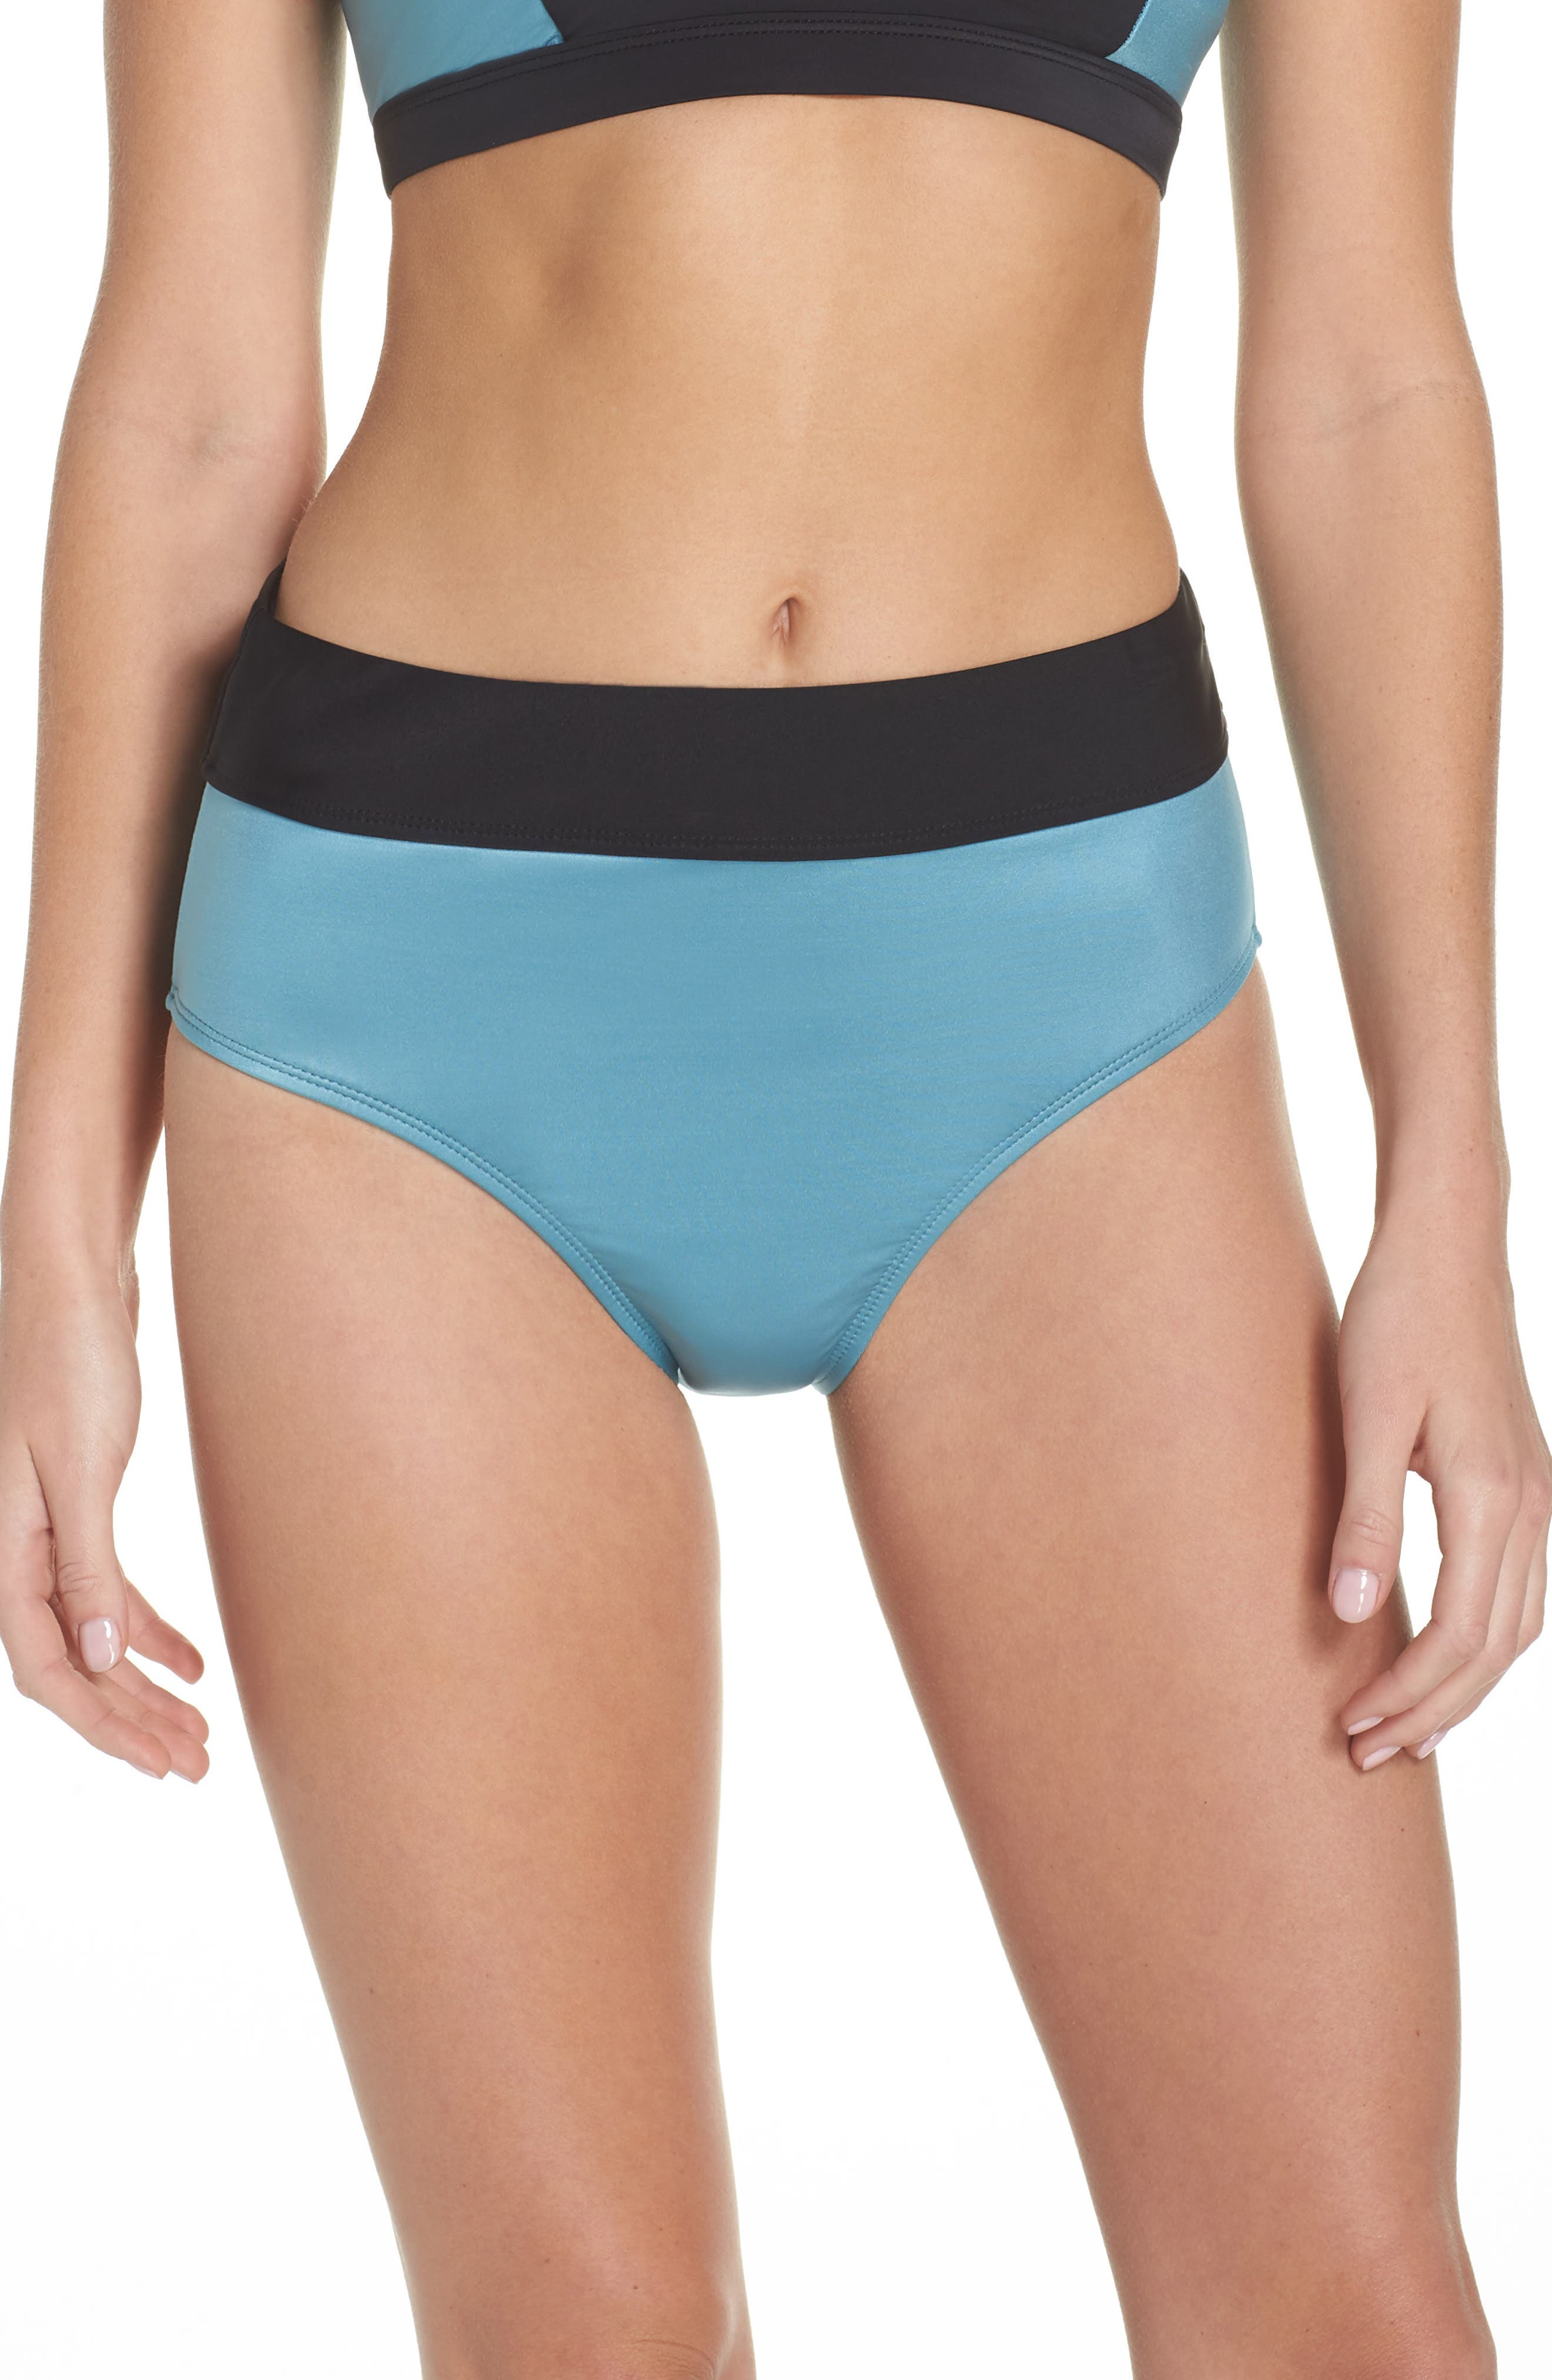 Element High Waist Bikini Bottoms,                         Main,                         color, TEAL DOLPHIN